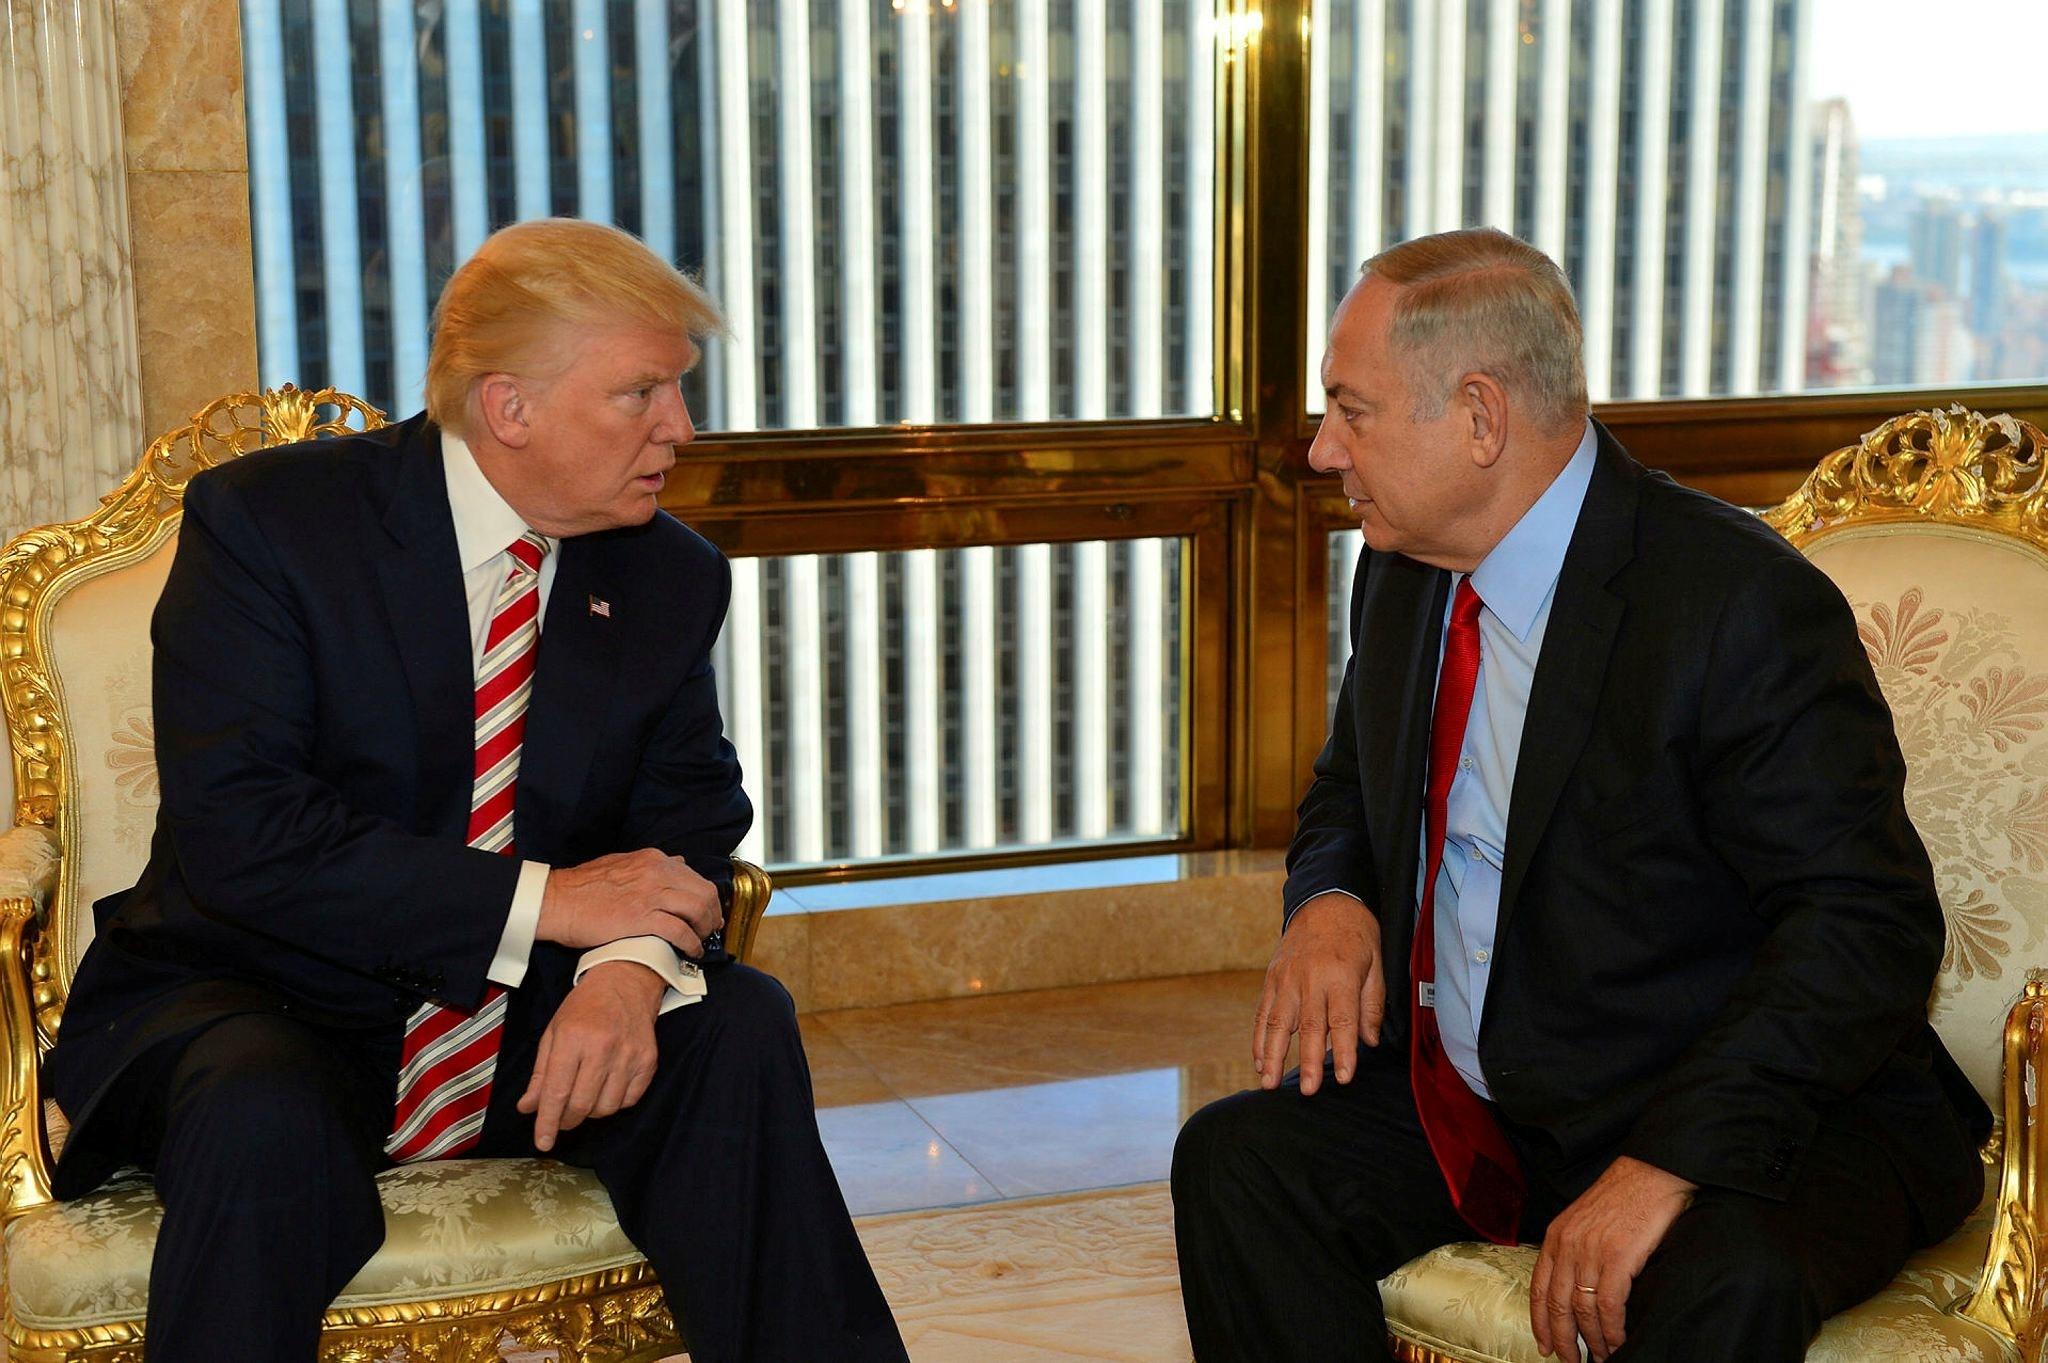 Israeli Prime Minister Benjamin Netanyahu speaks to U.S. President Donald Trump during their meeting in New York, Sept. 25.